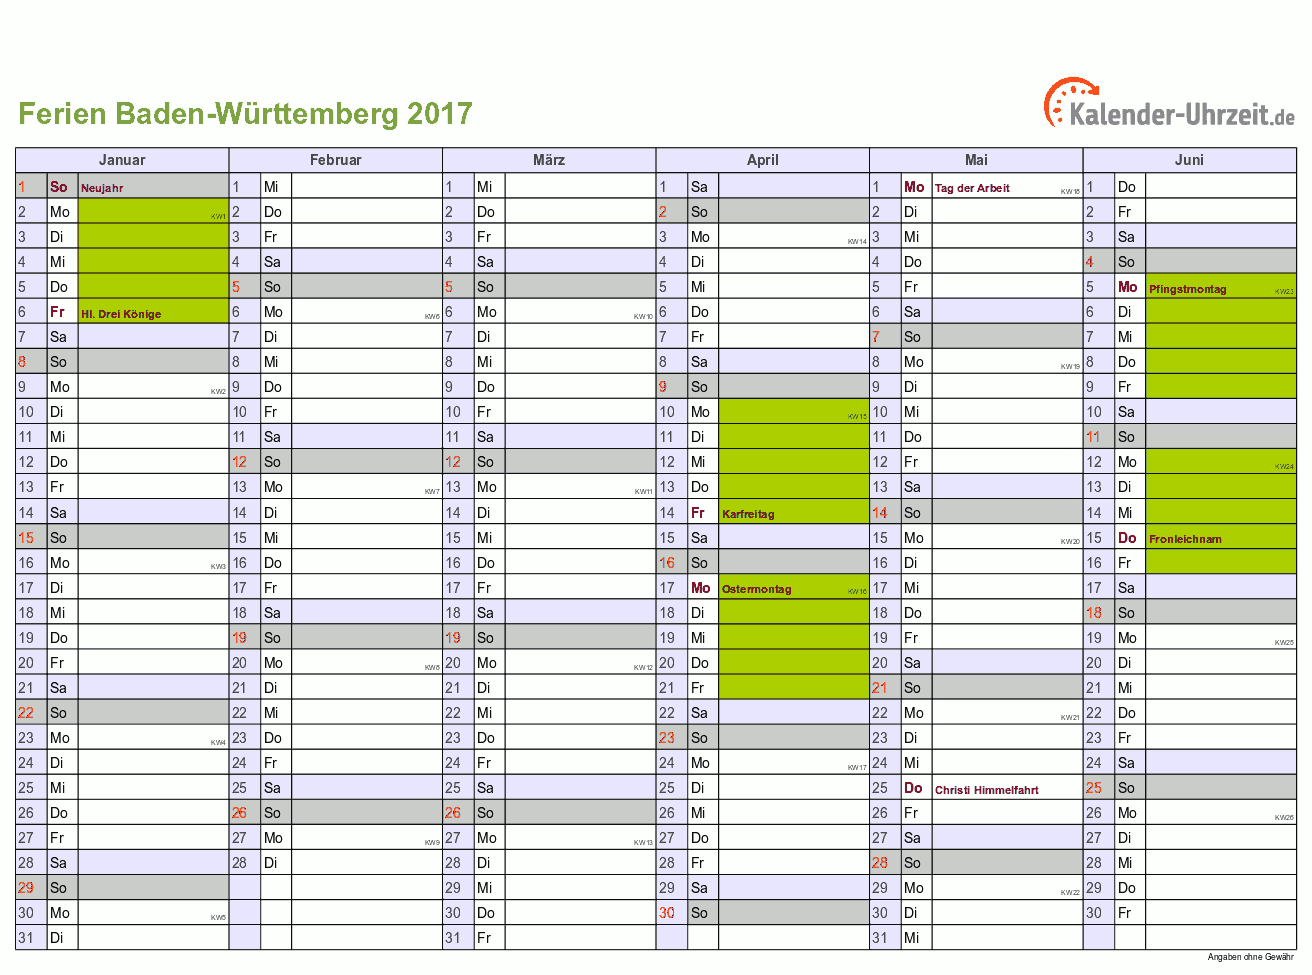 Singlebörse kostenlos baden-württemberg